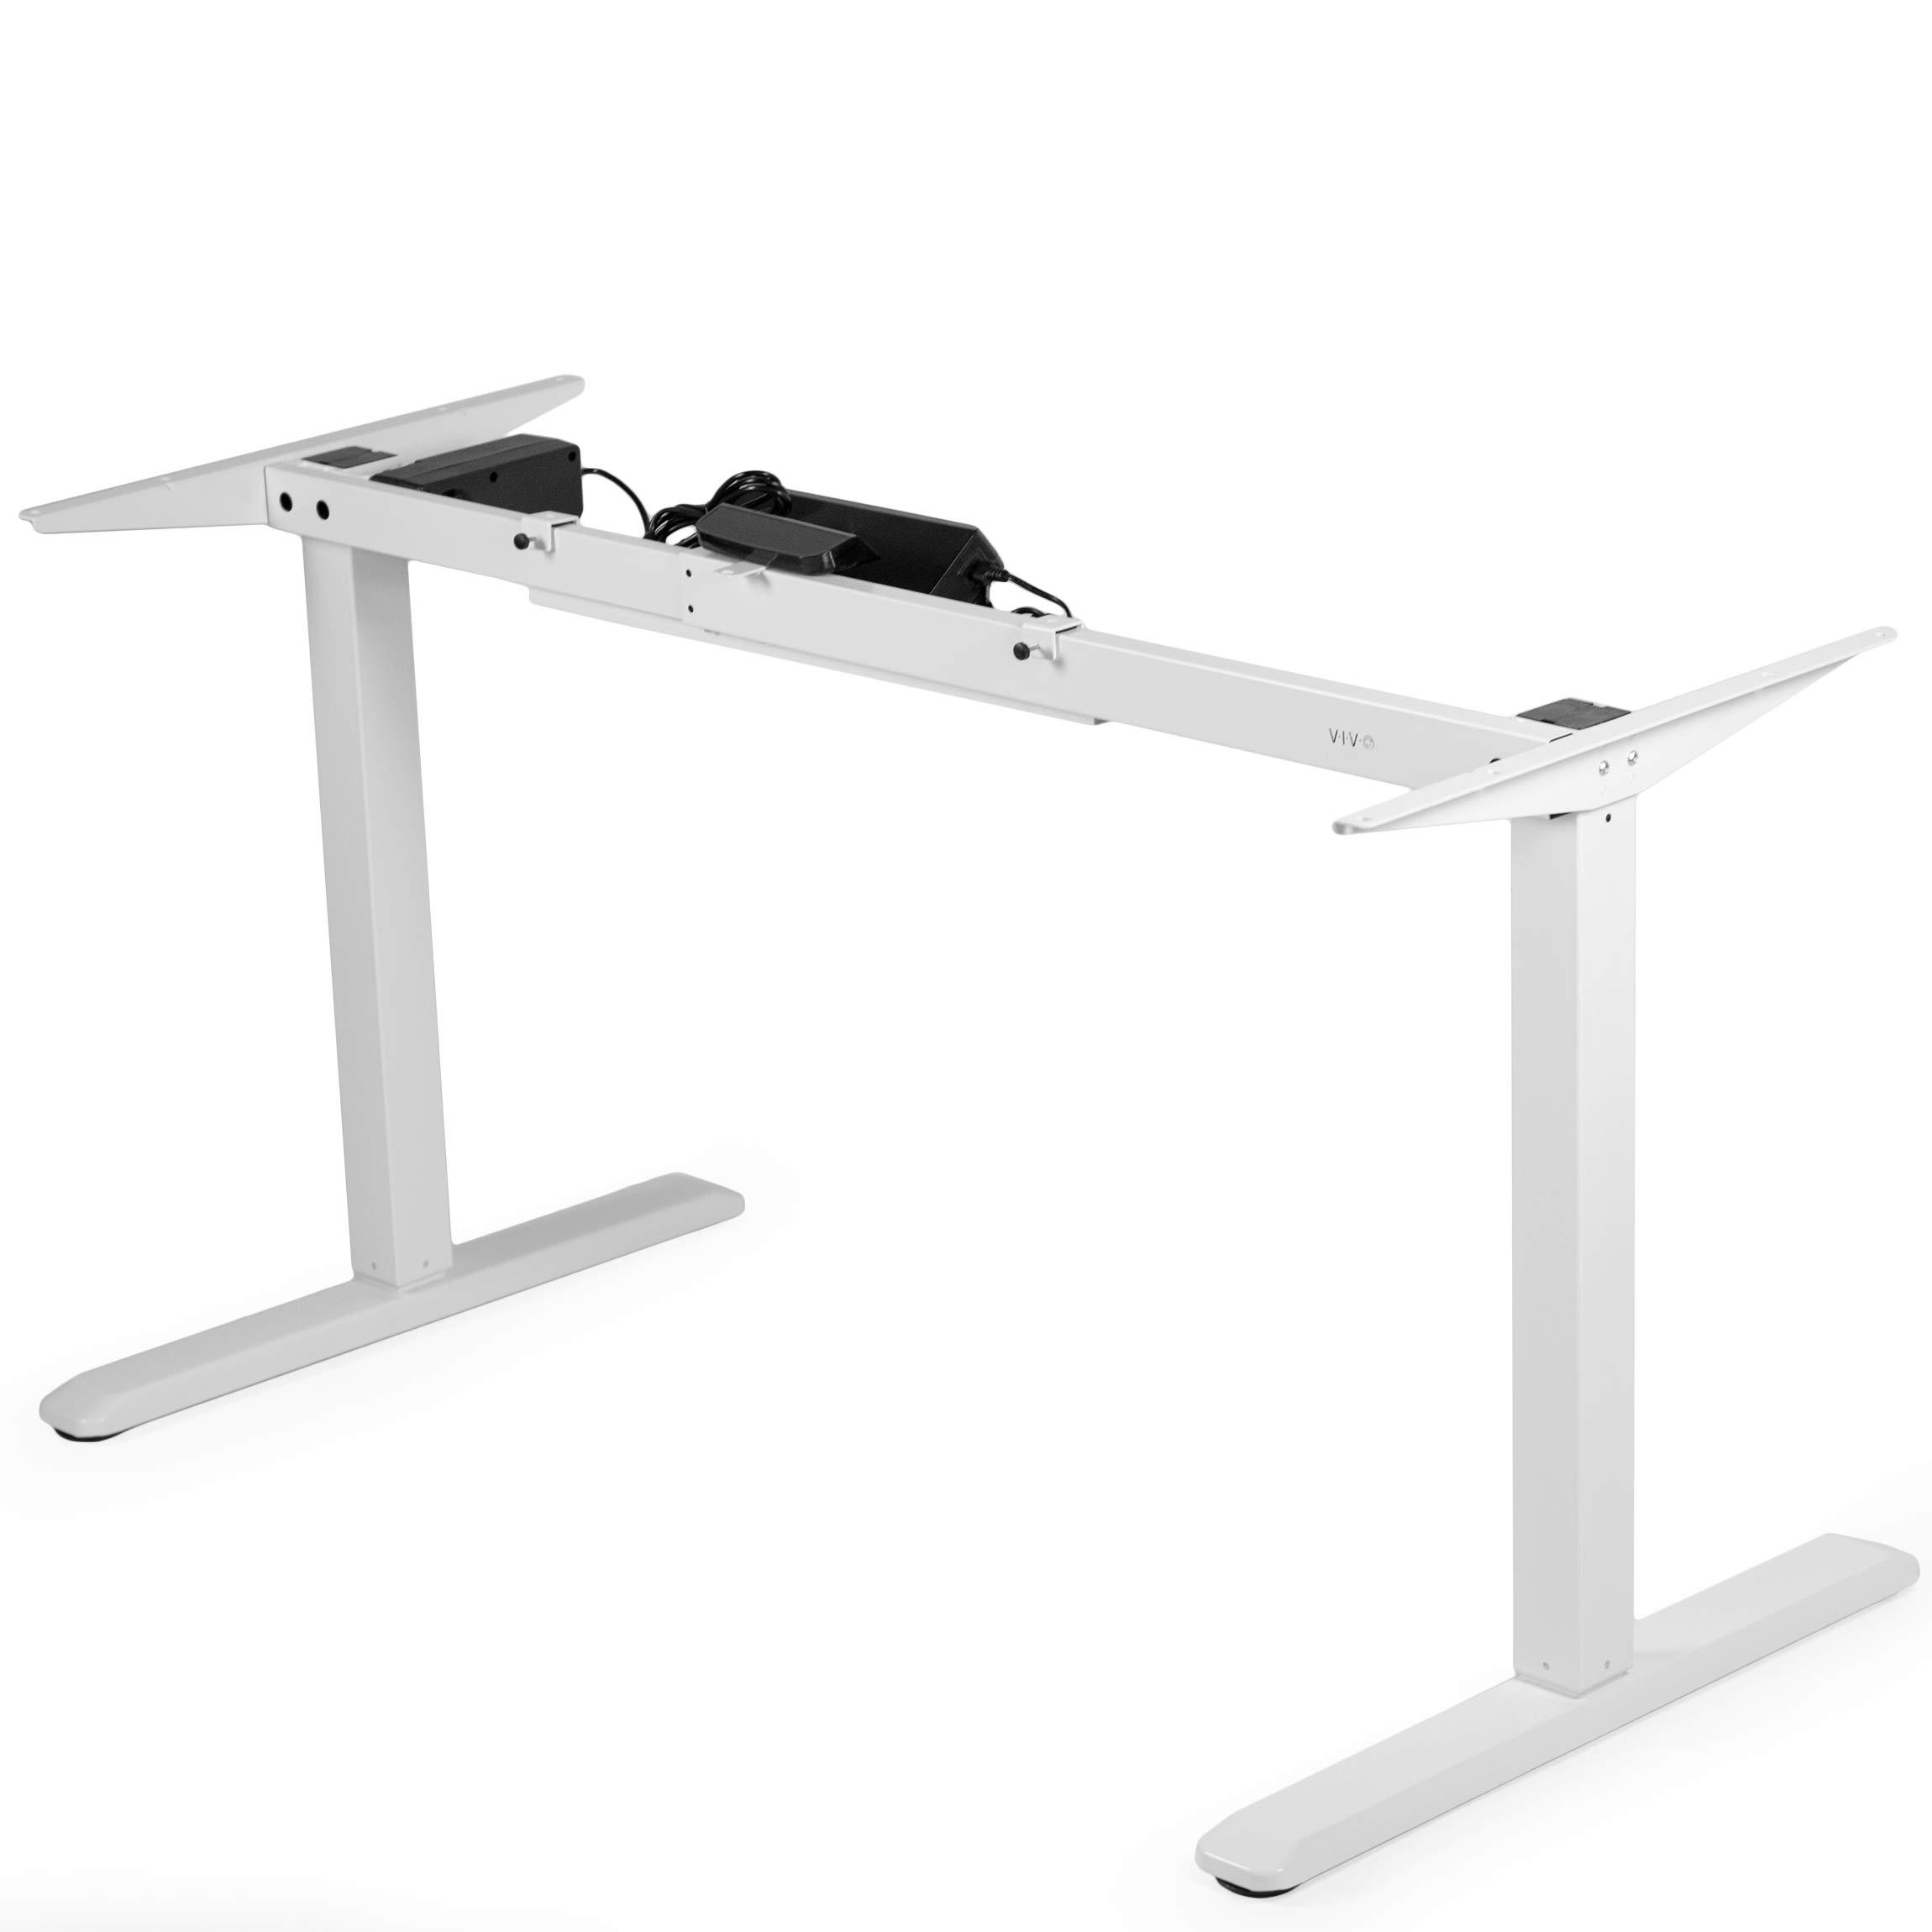 VIVO White Electric Stand Up Desk Frame Workstation, Single Motor Ergonomic Standing Height Adjustable Base (DESK-V102EW)